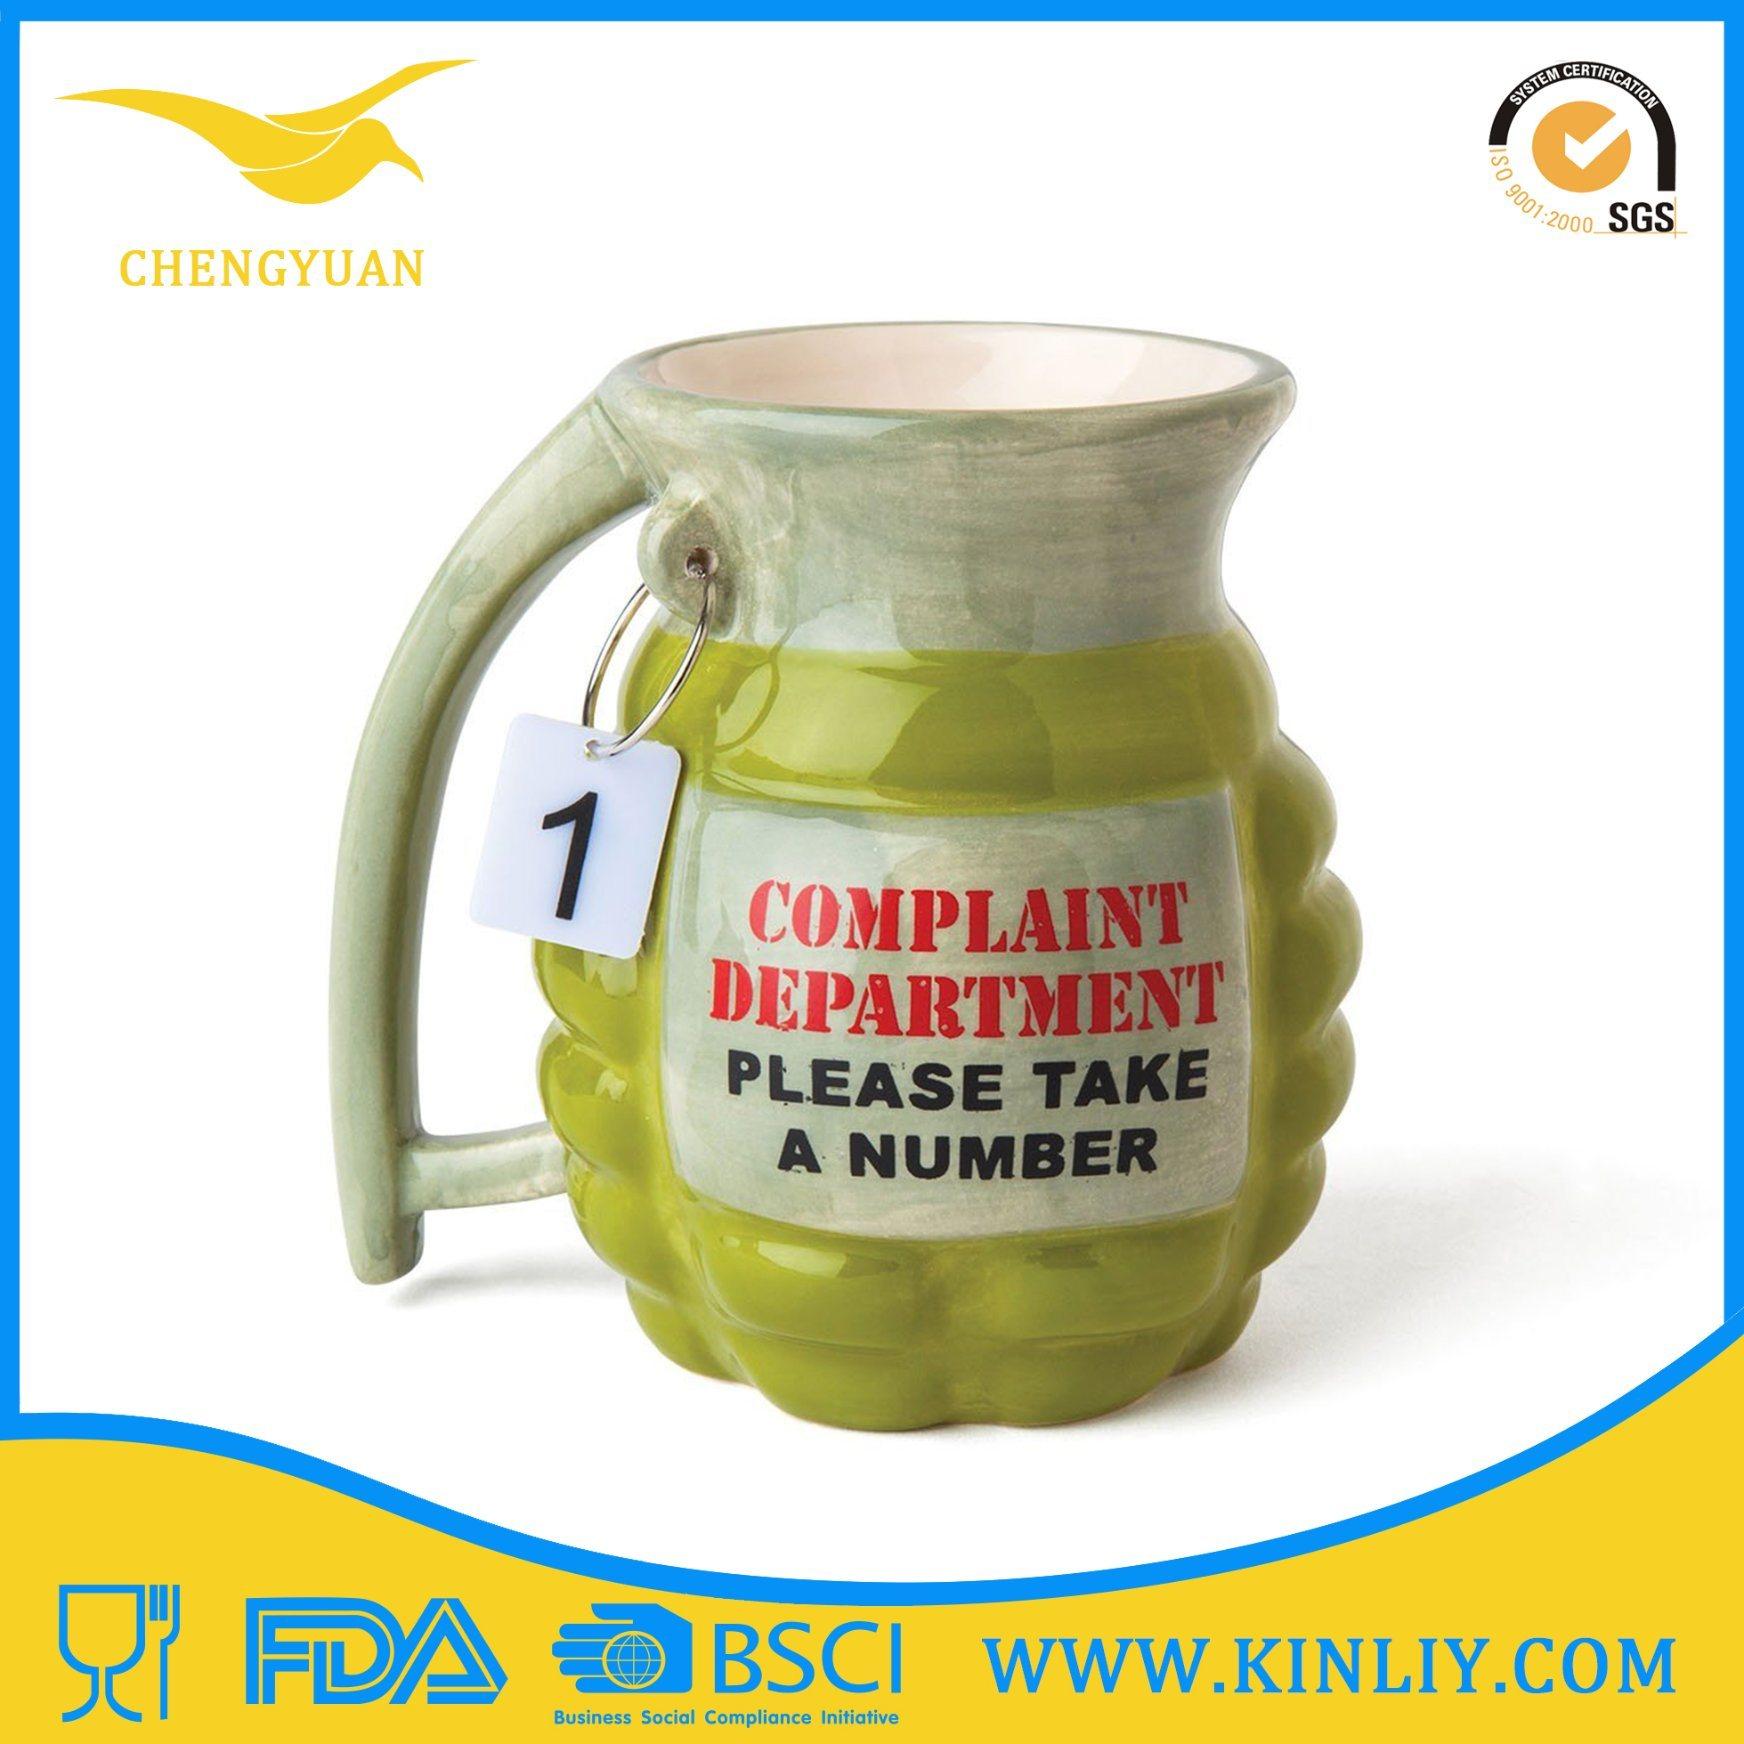 Gamepad Ceramic Tea Cup Coffee Mug with Funny Design